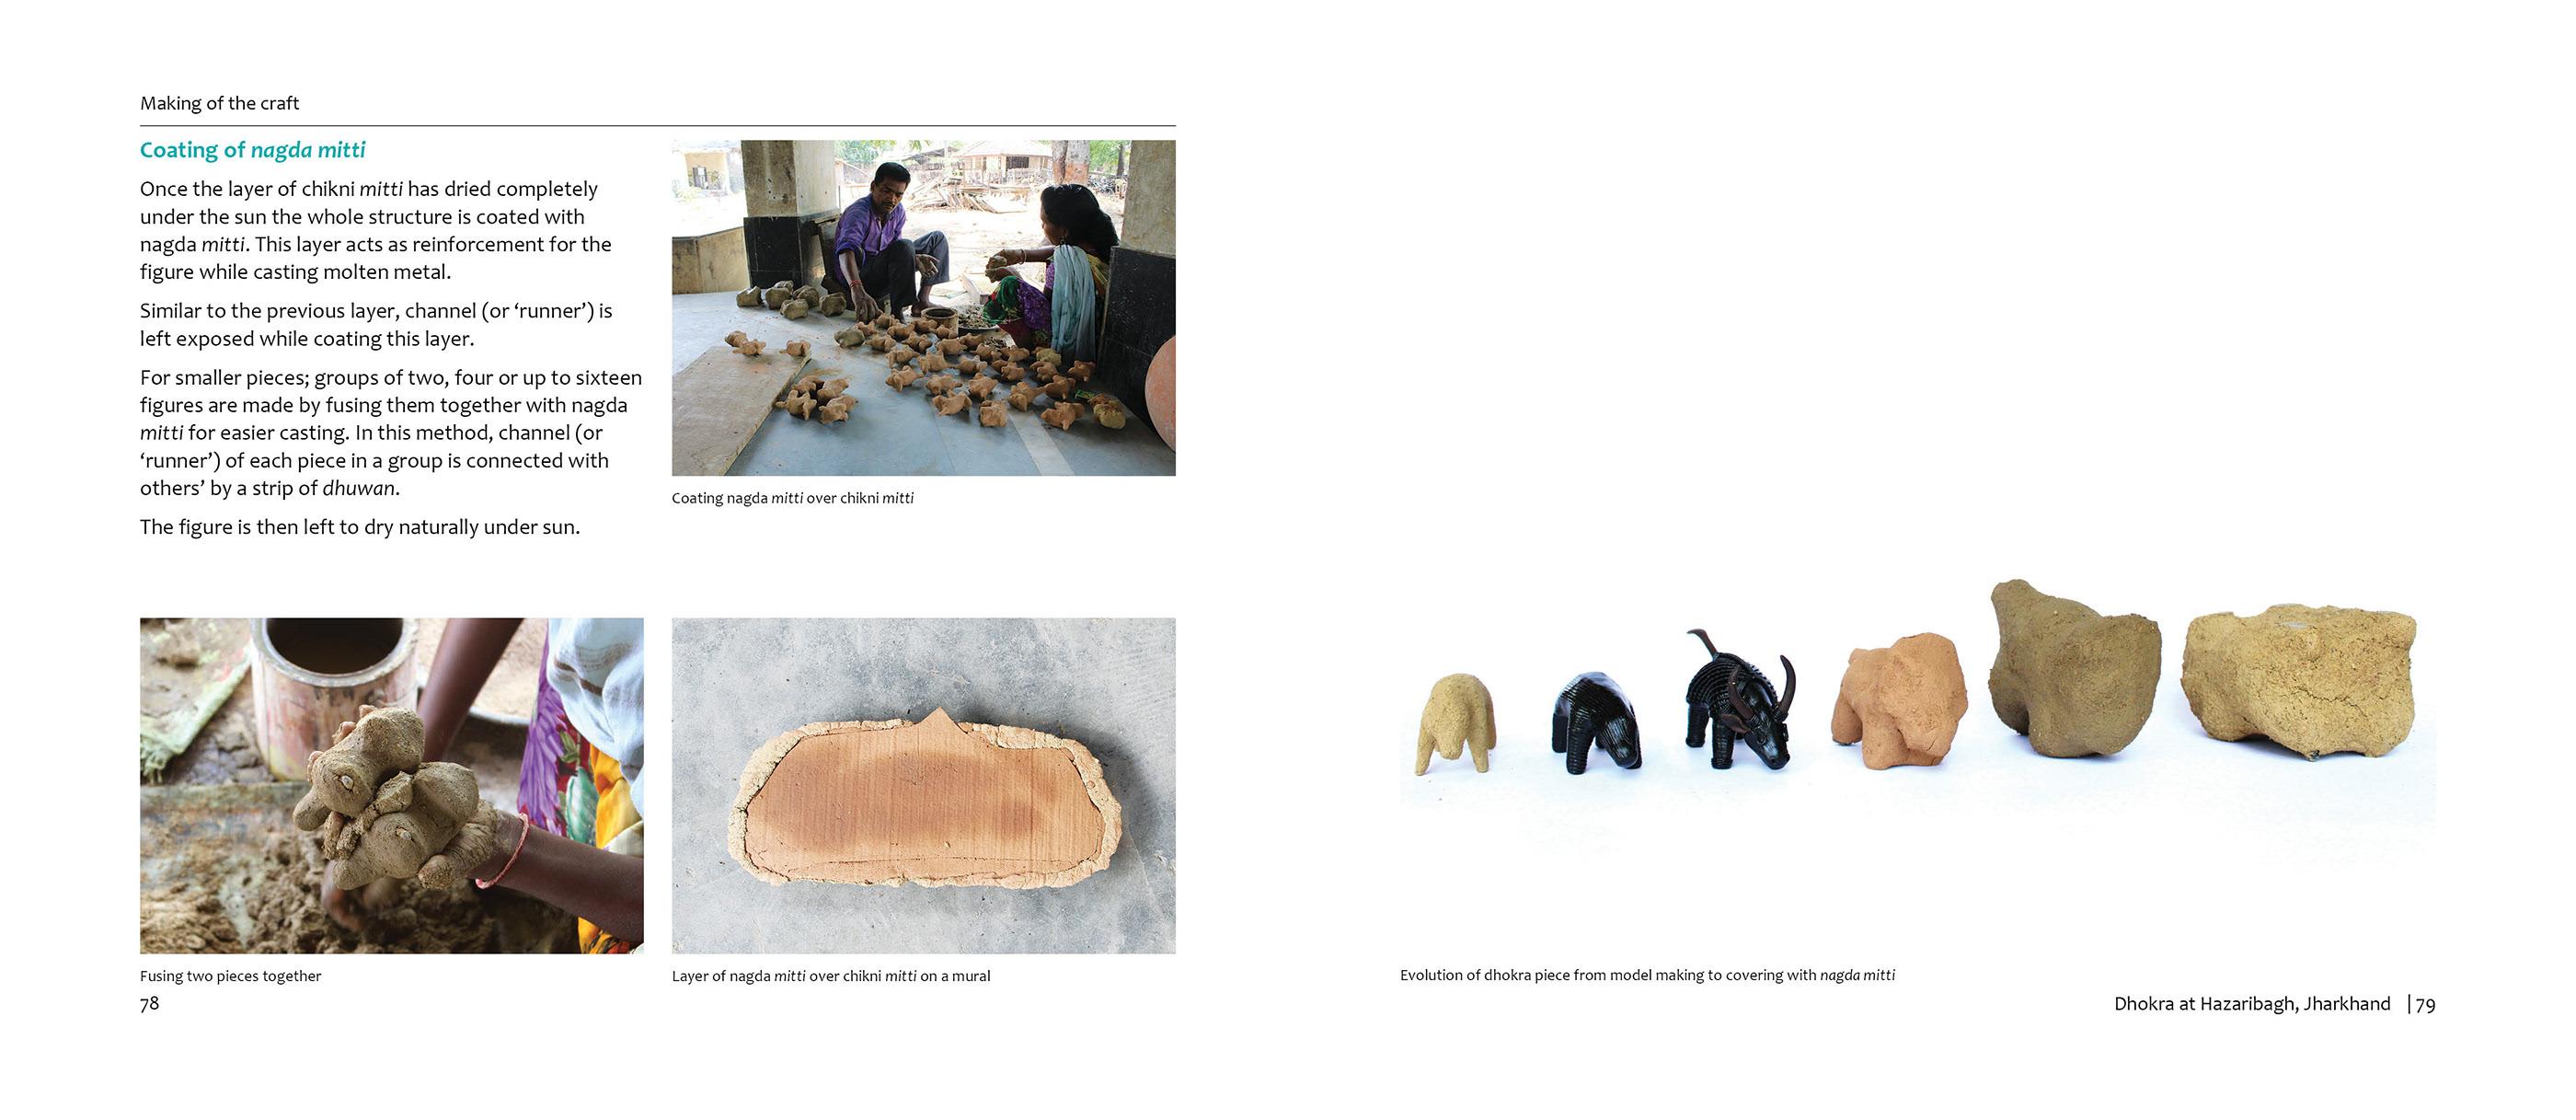 Craft Documentation: Dhokra at Hazaribagh, Jharkhand on Behance